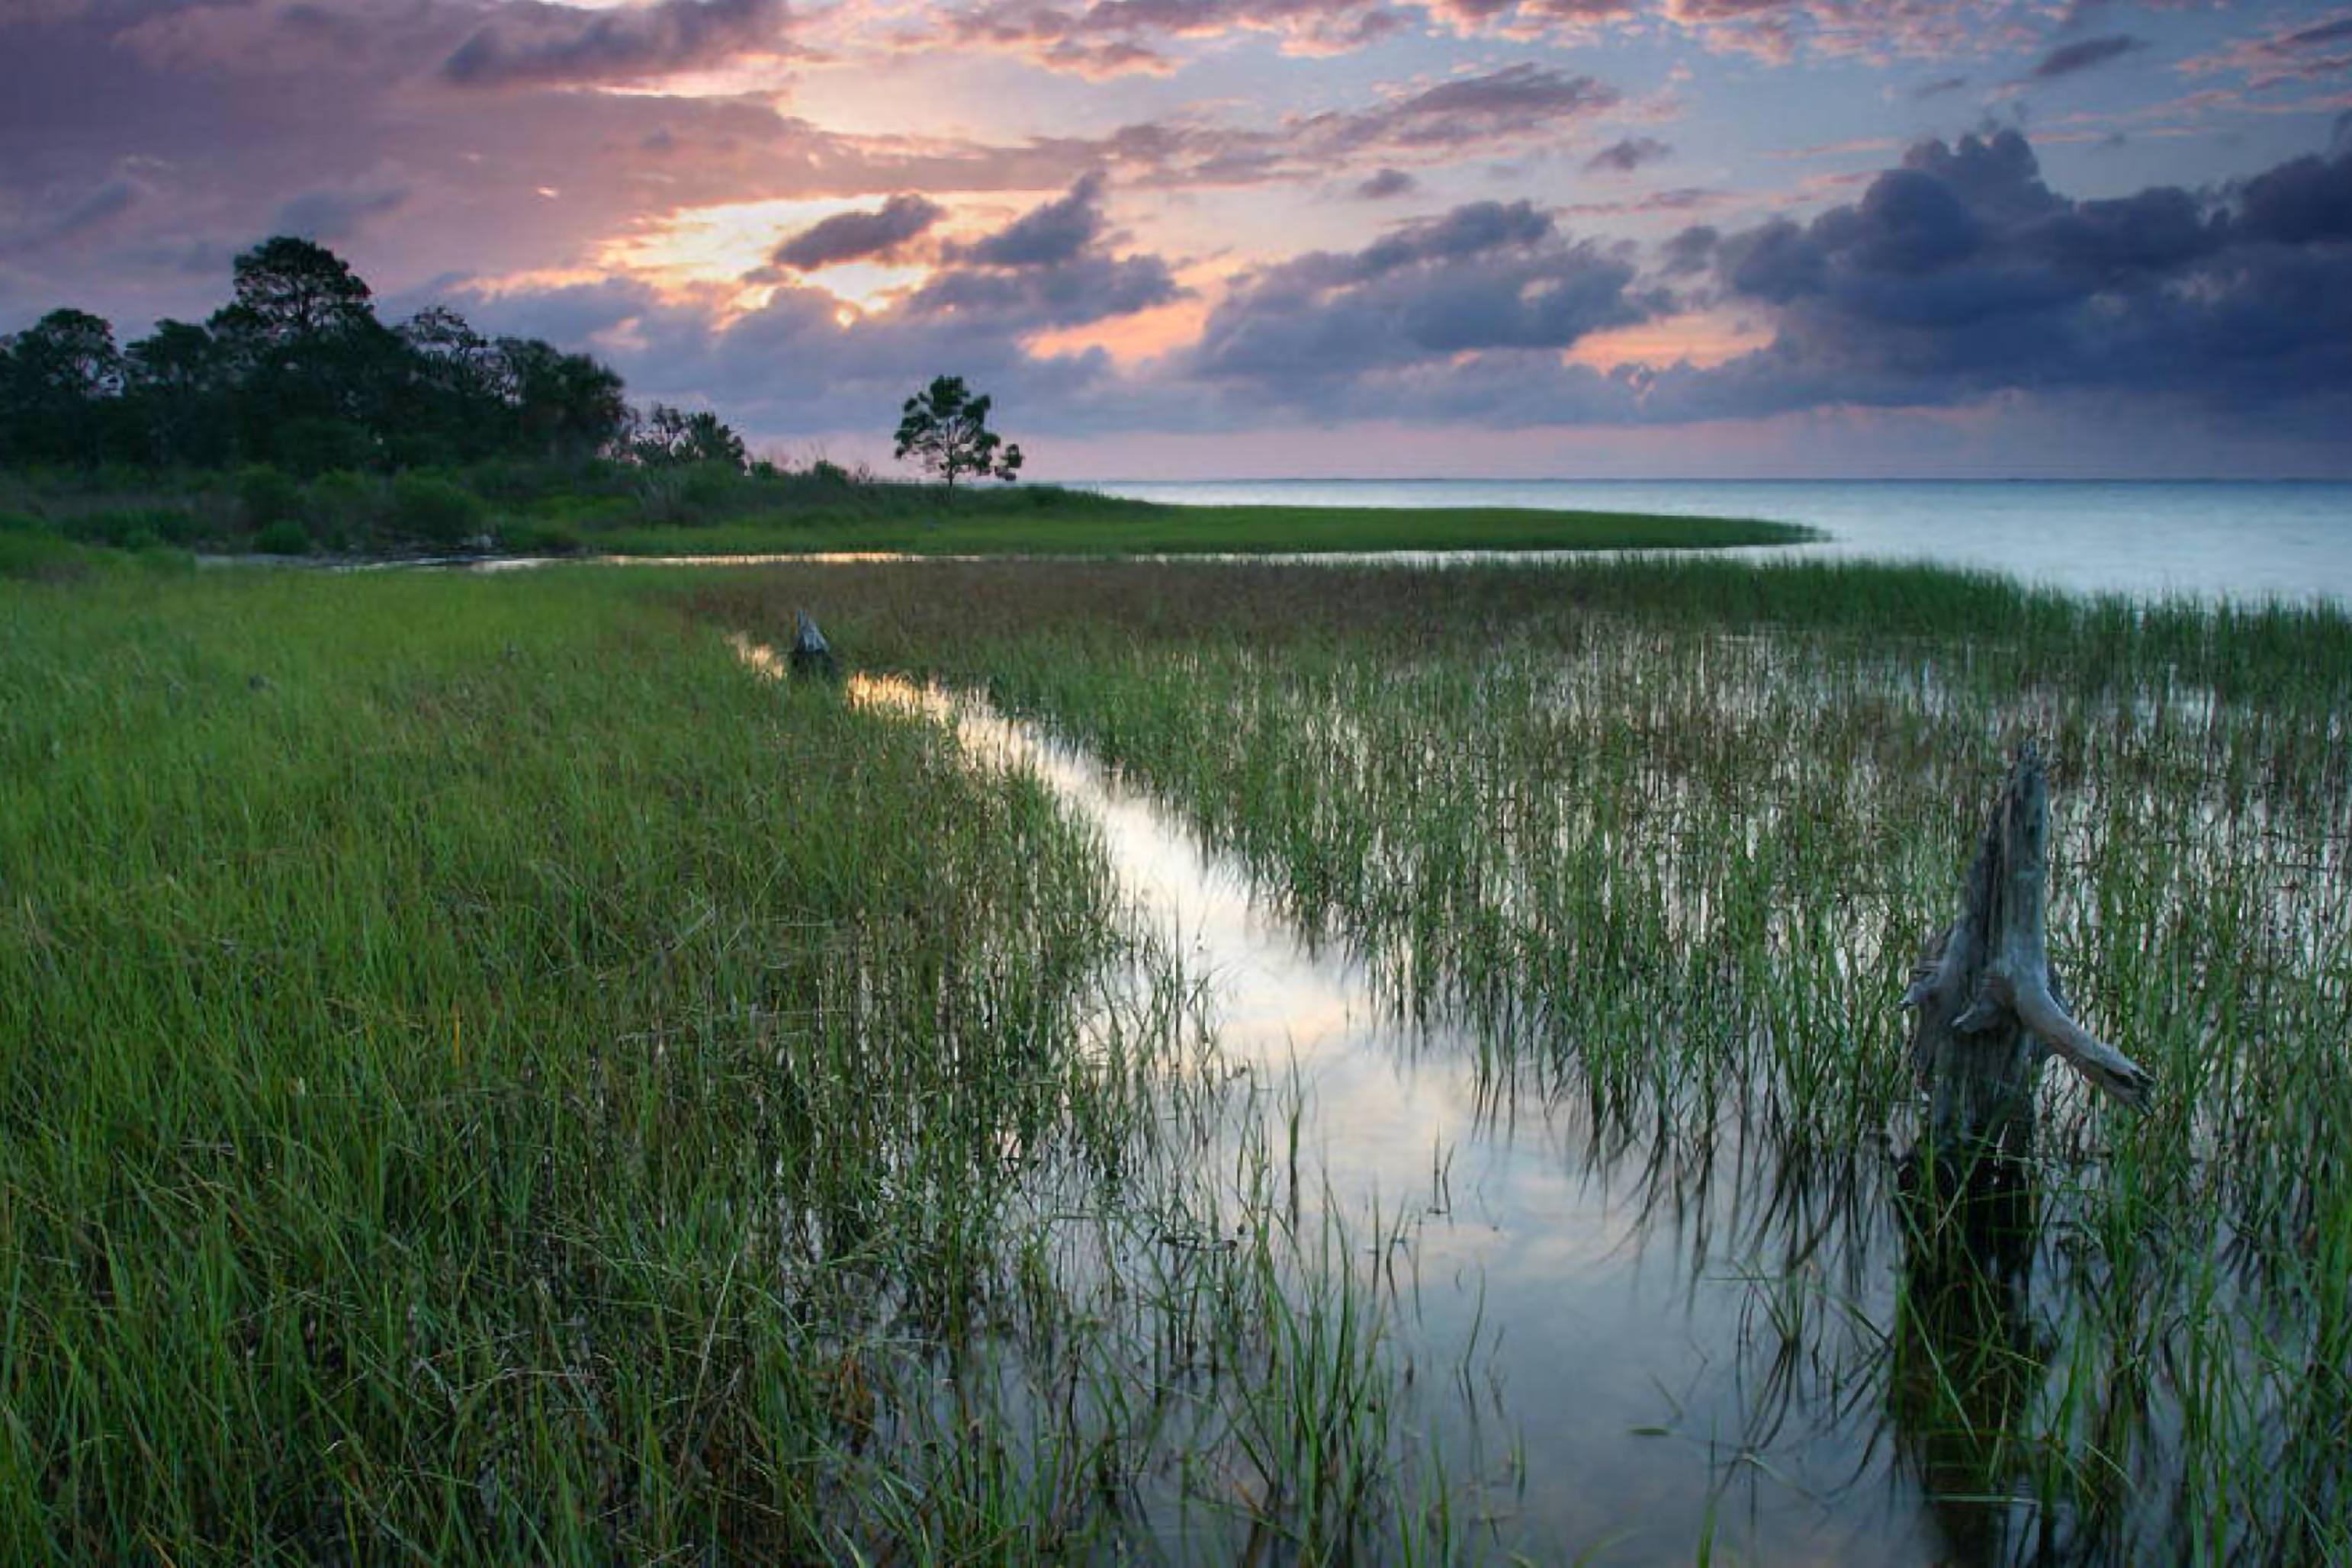 Coastal marsh habitat landscape in Florida, with marsh, trees and a sunset.